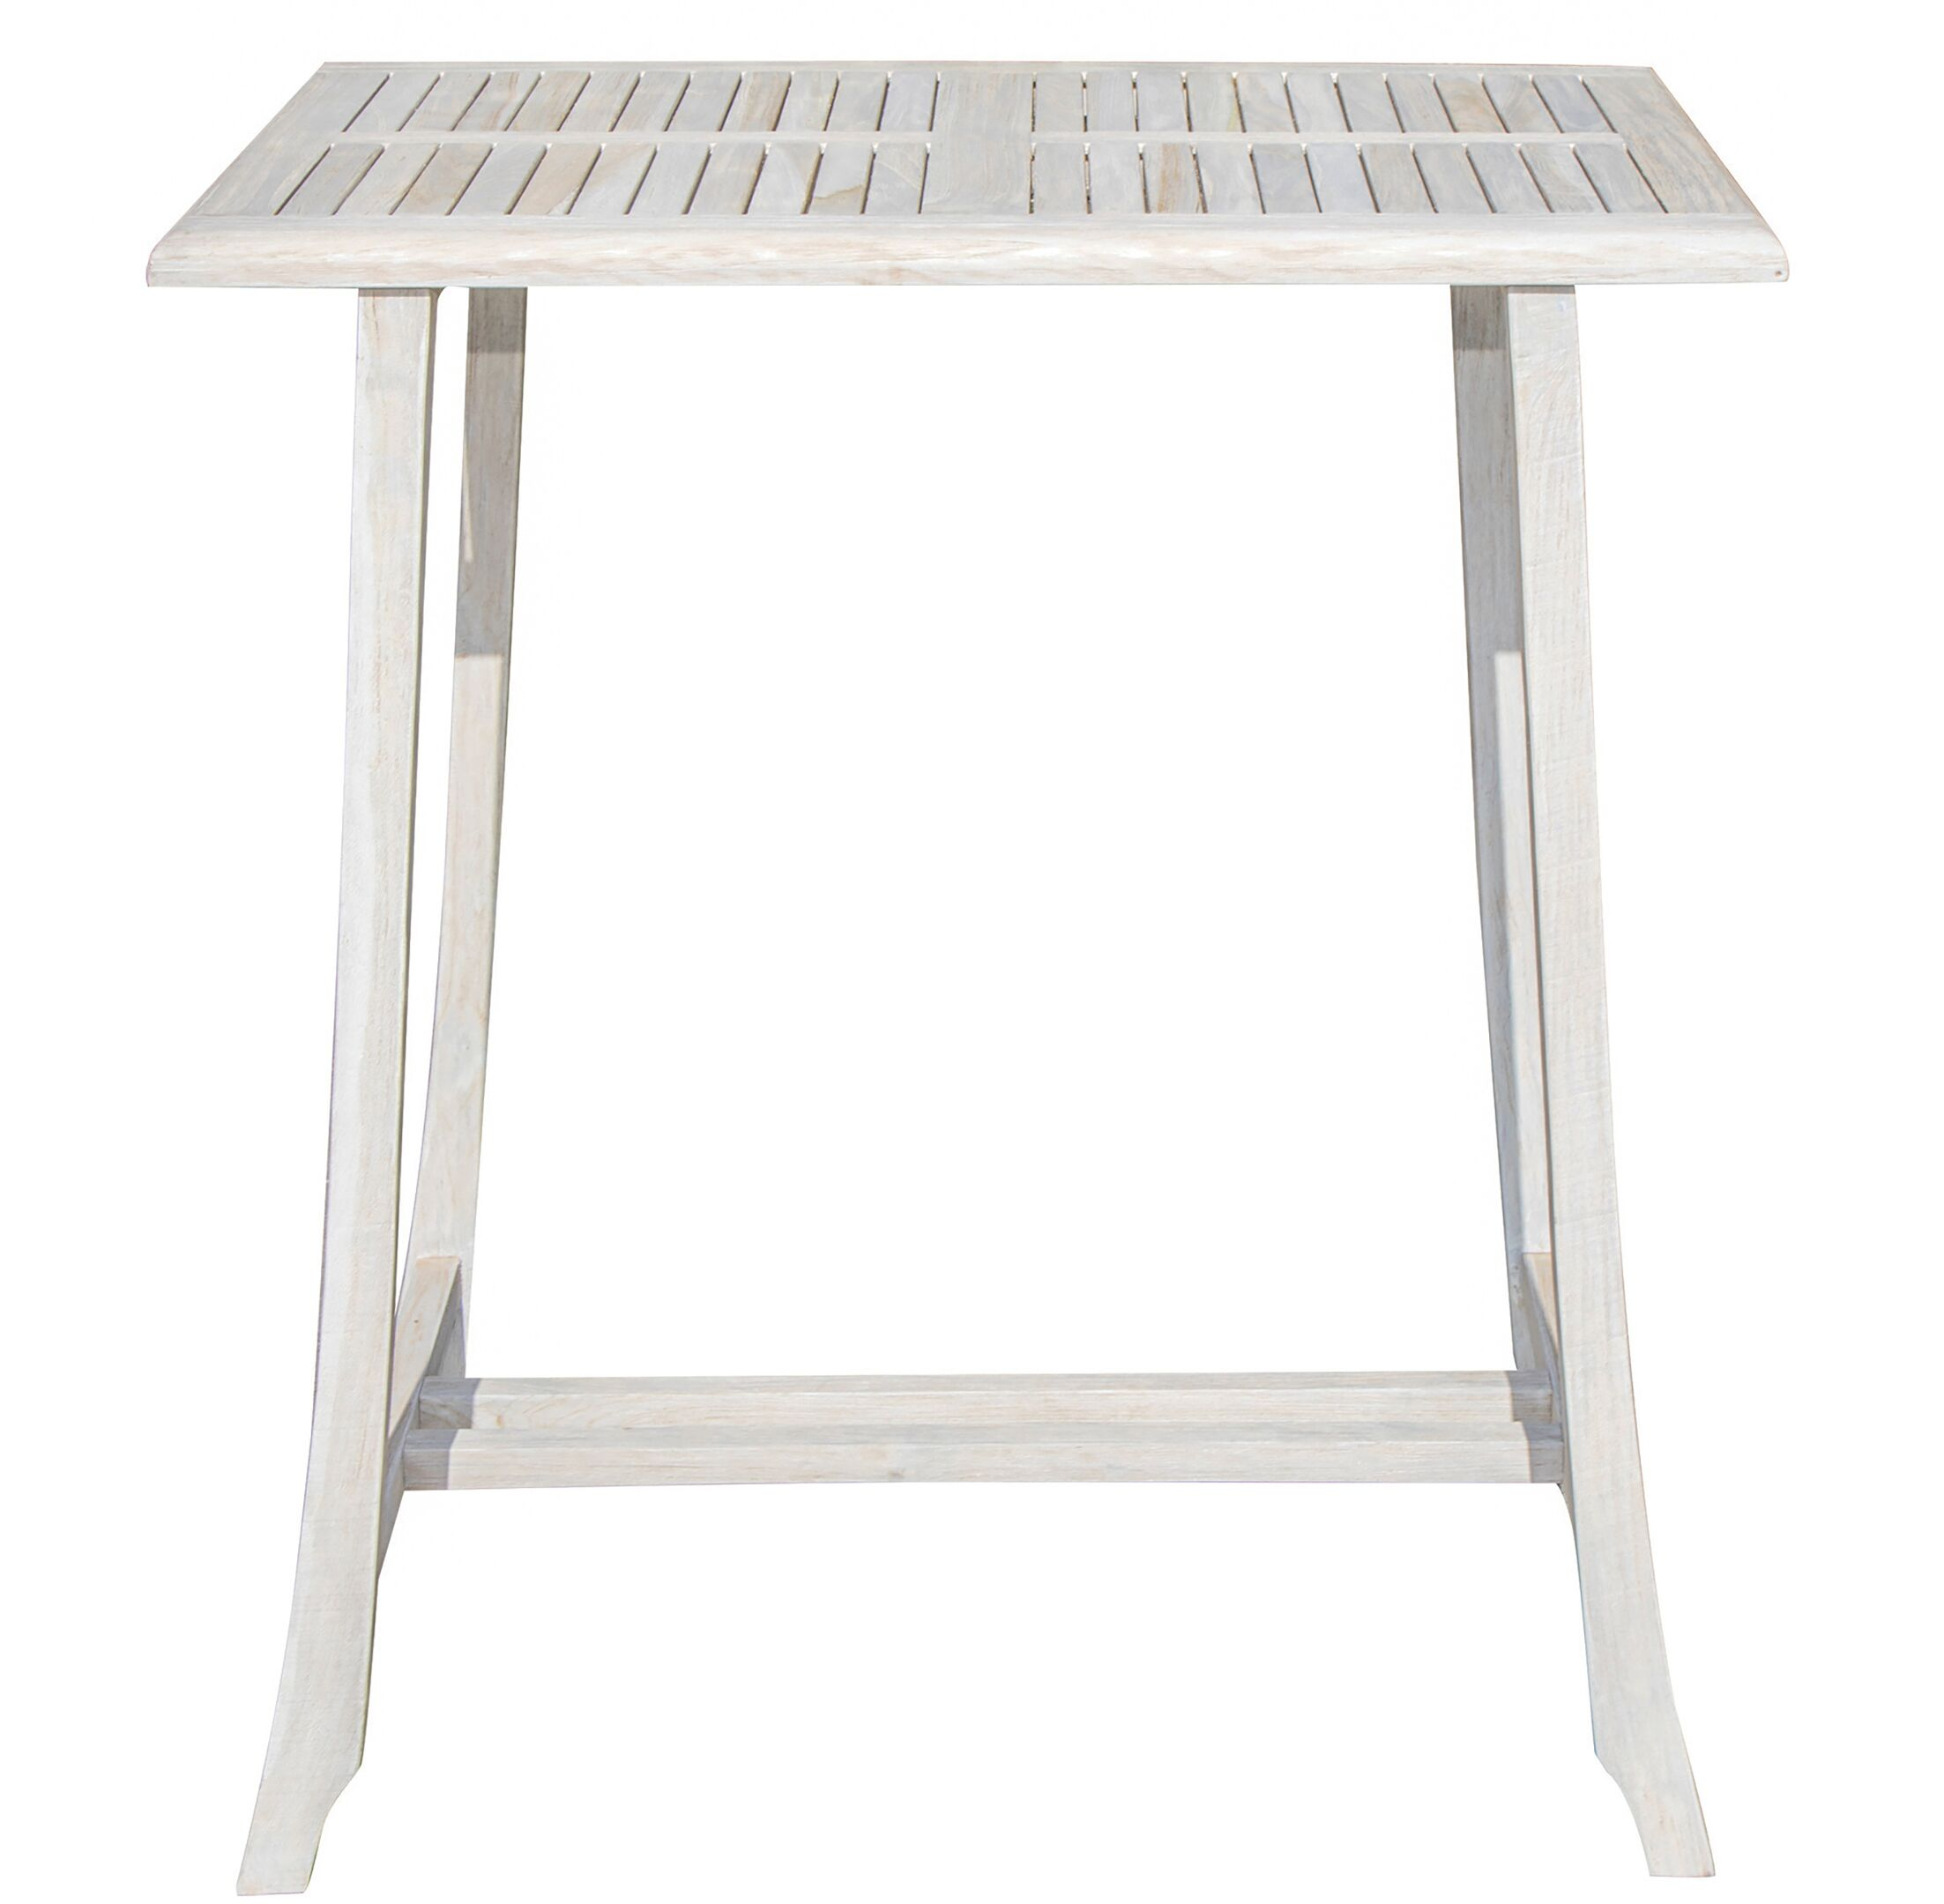 Satori Bistro Teak Dining Table Table Height: 34